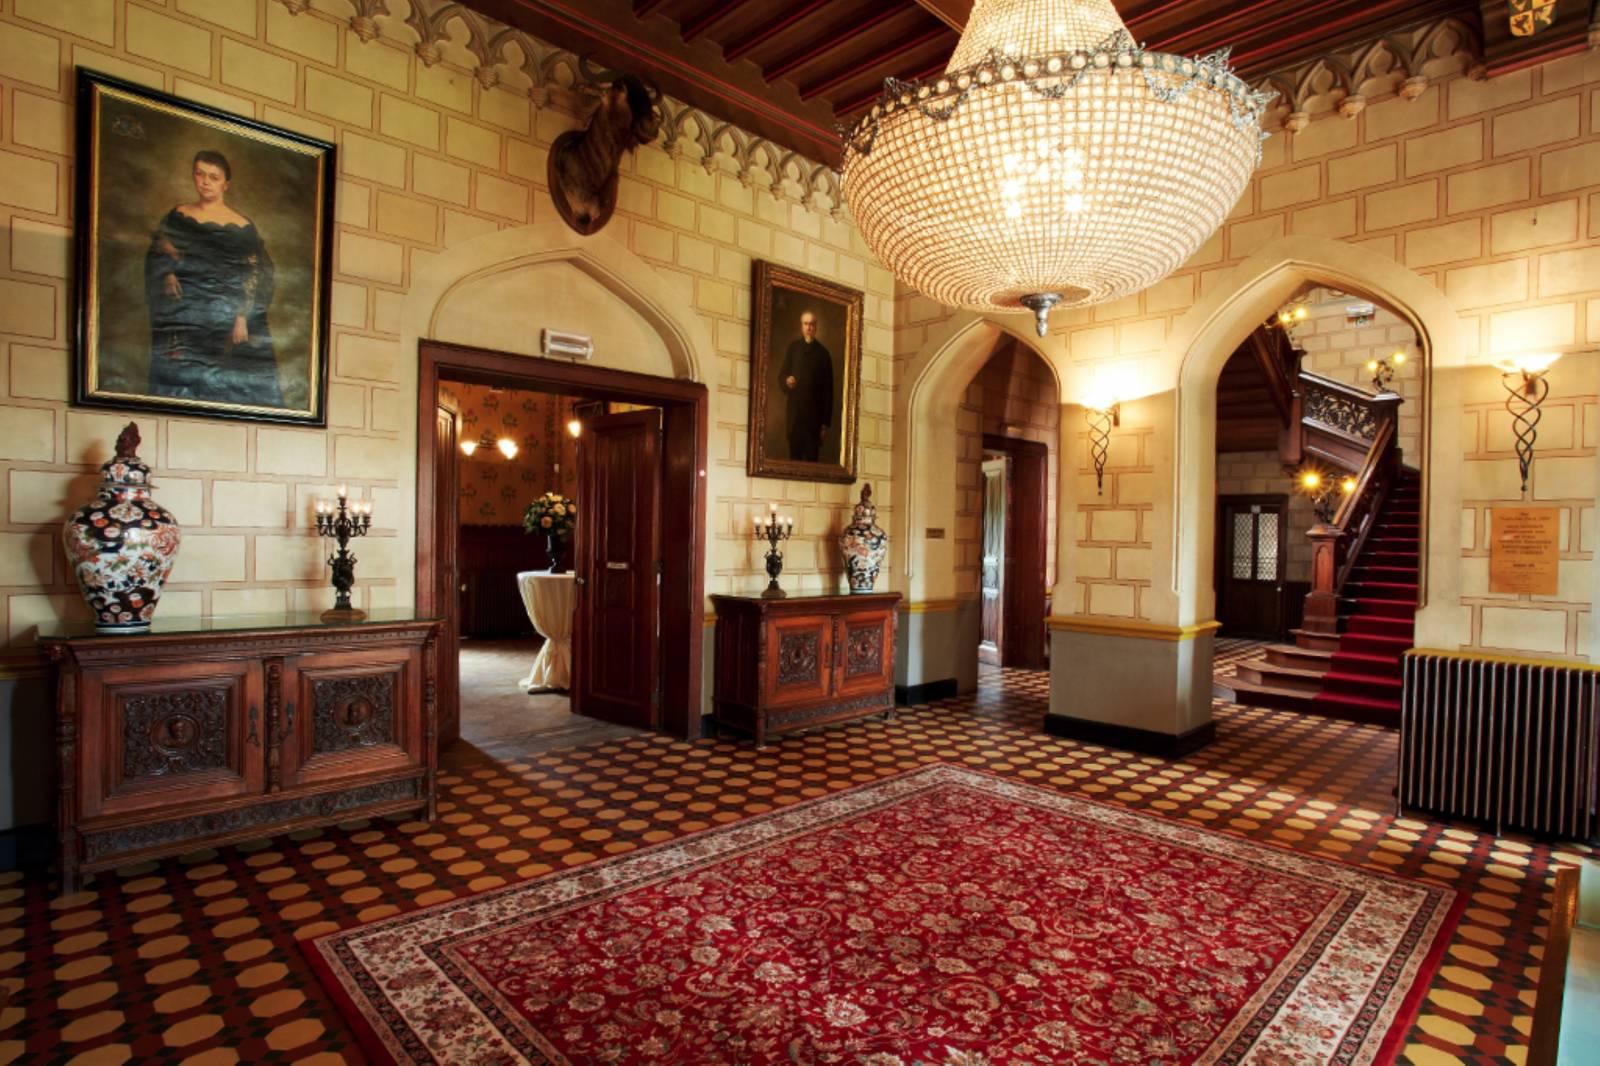 Kasteel D'artrycke - Feestzaal - House of Weddings (2)